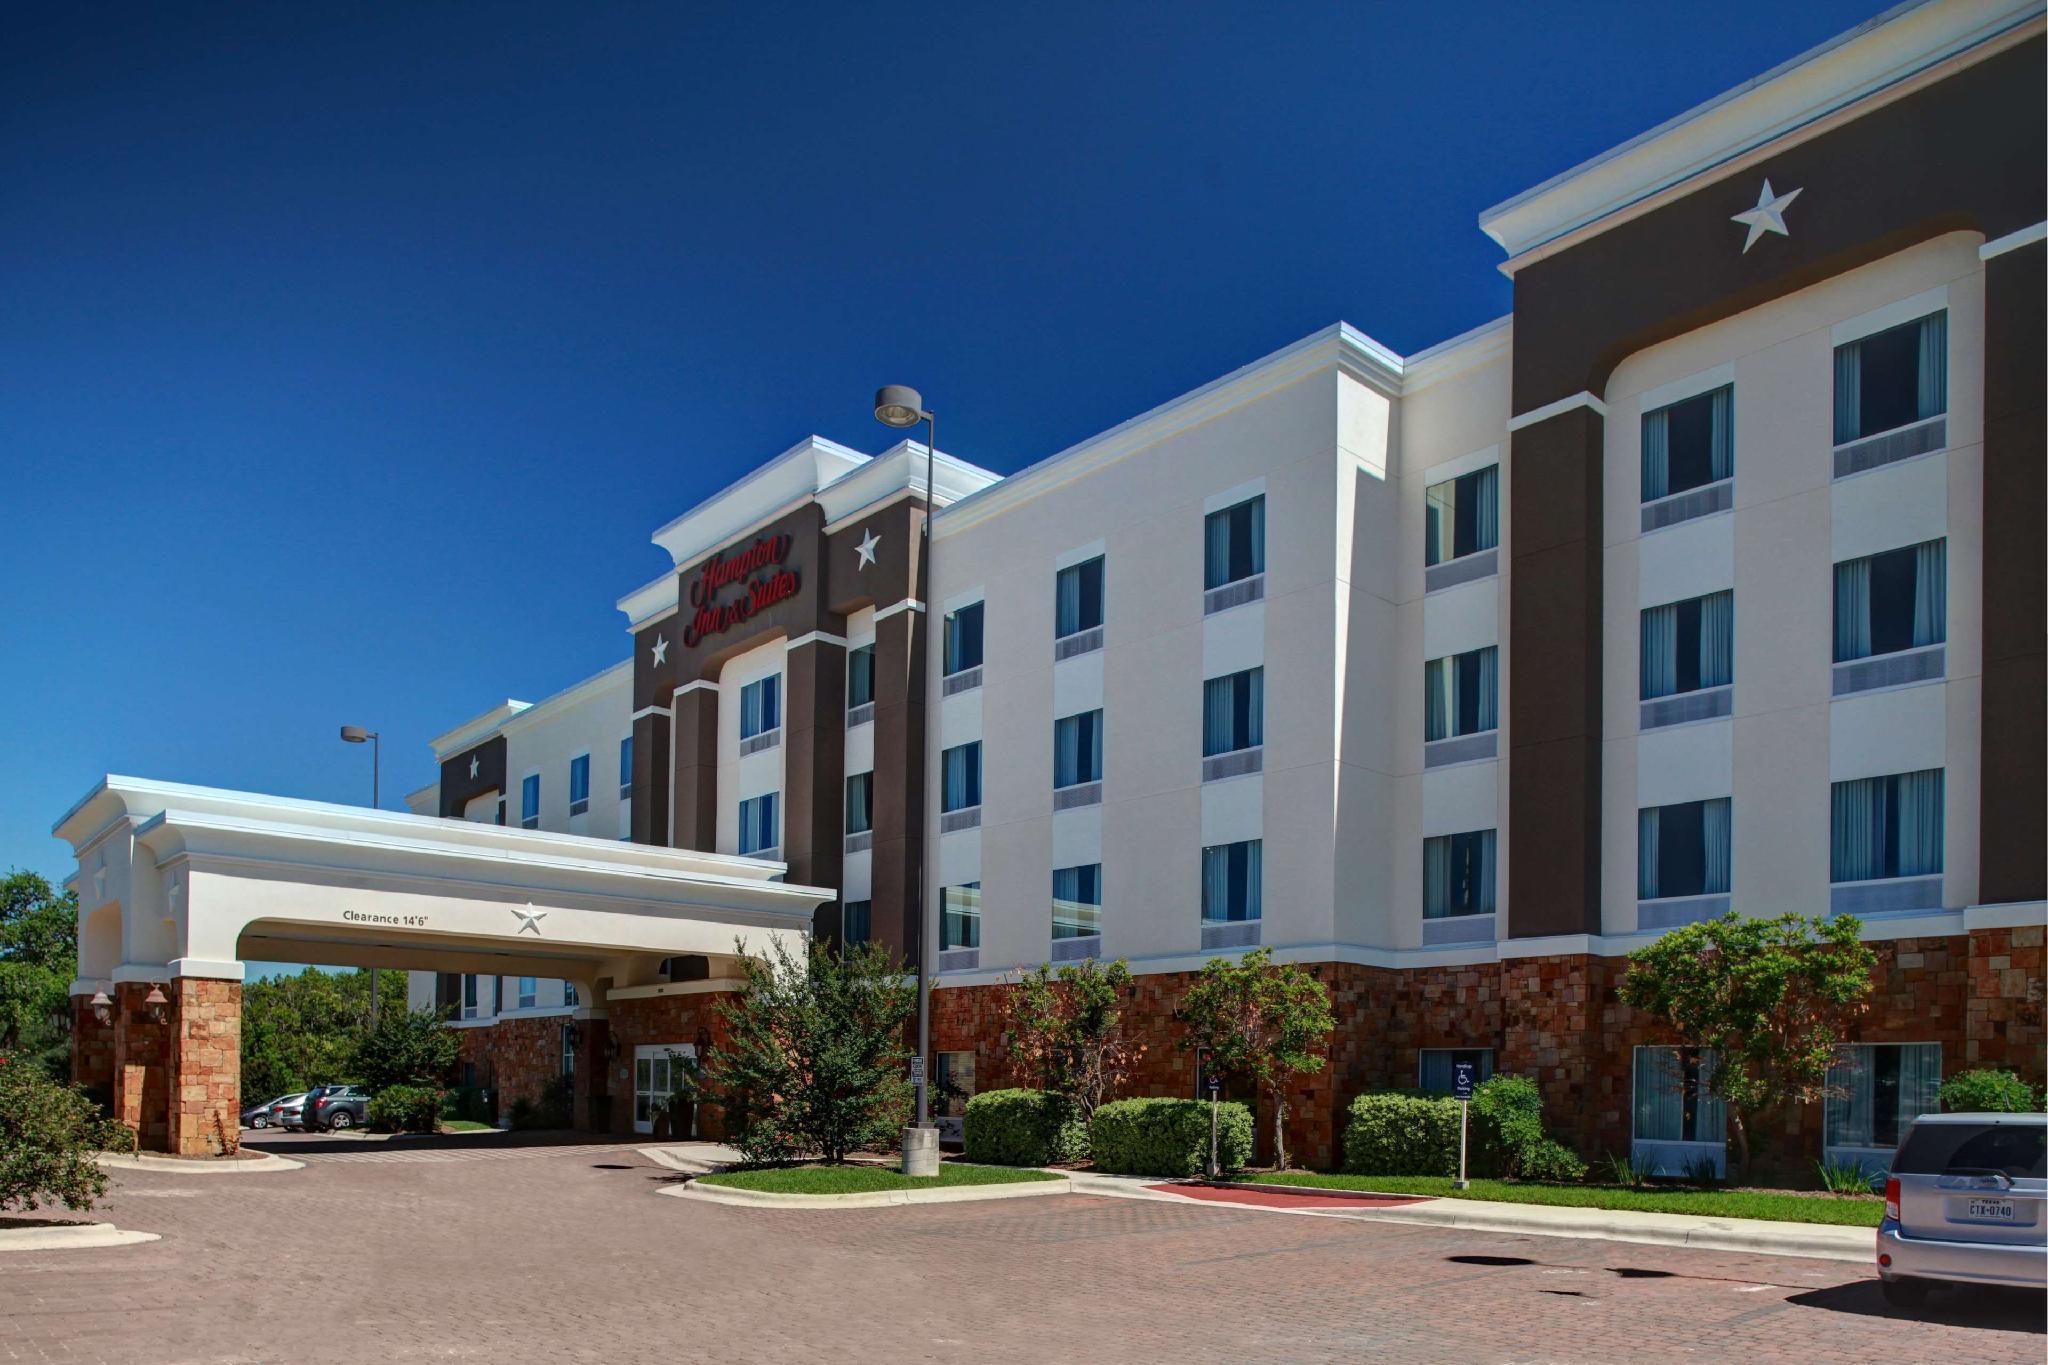 Hampton Inn And Suites Boerne